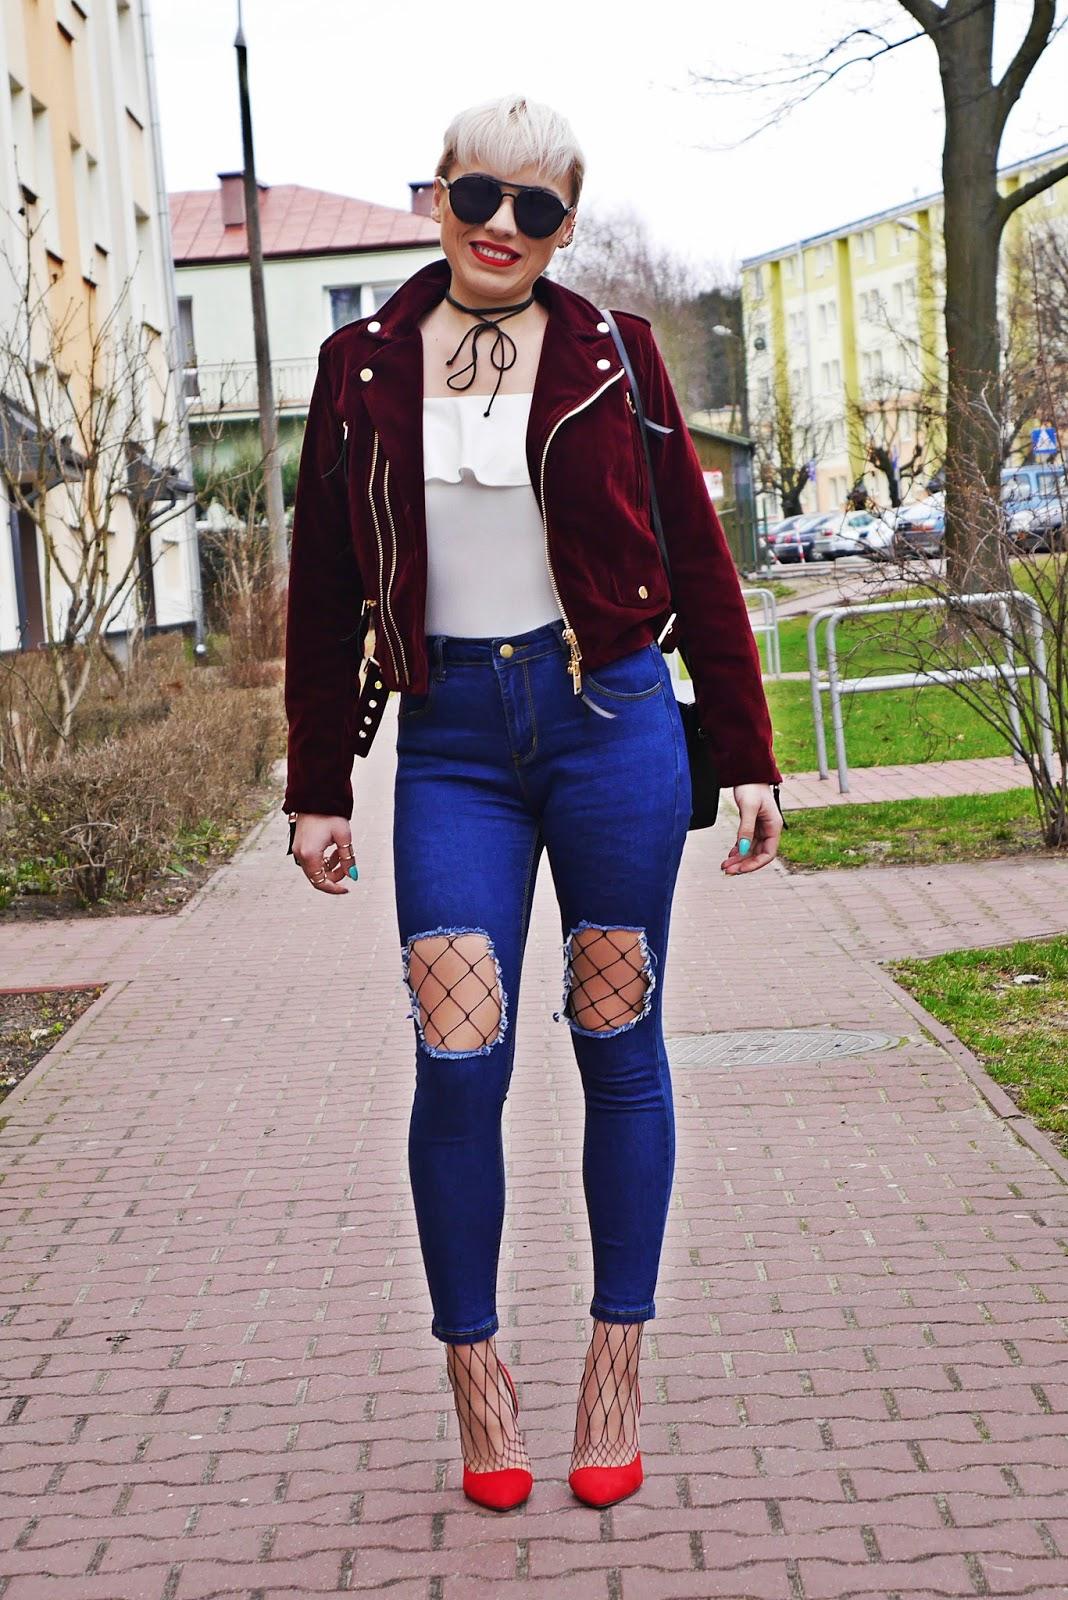 czerwone_szpilki_welurowa_ramoneska_karyn_blog_look-ootd_300317a